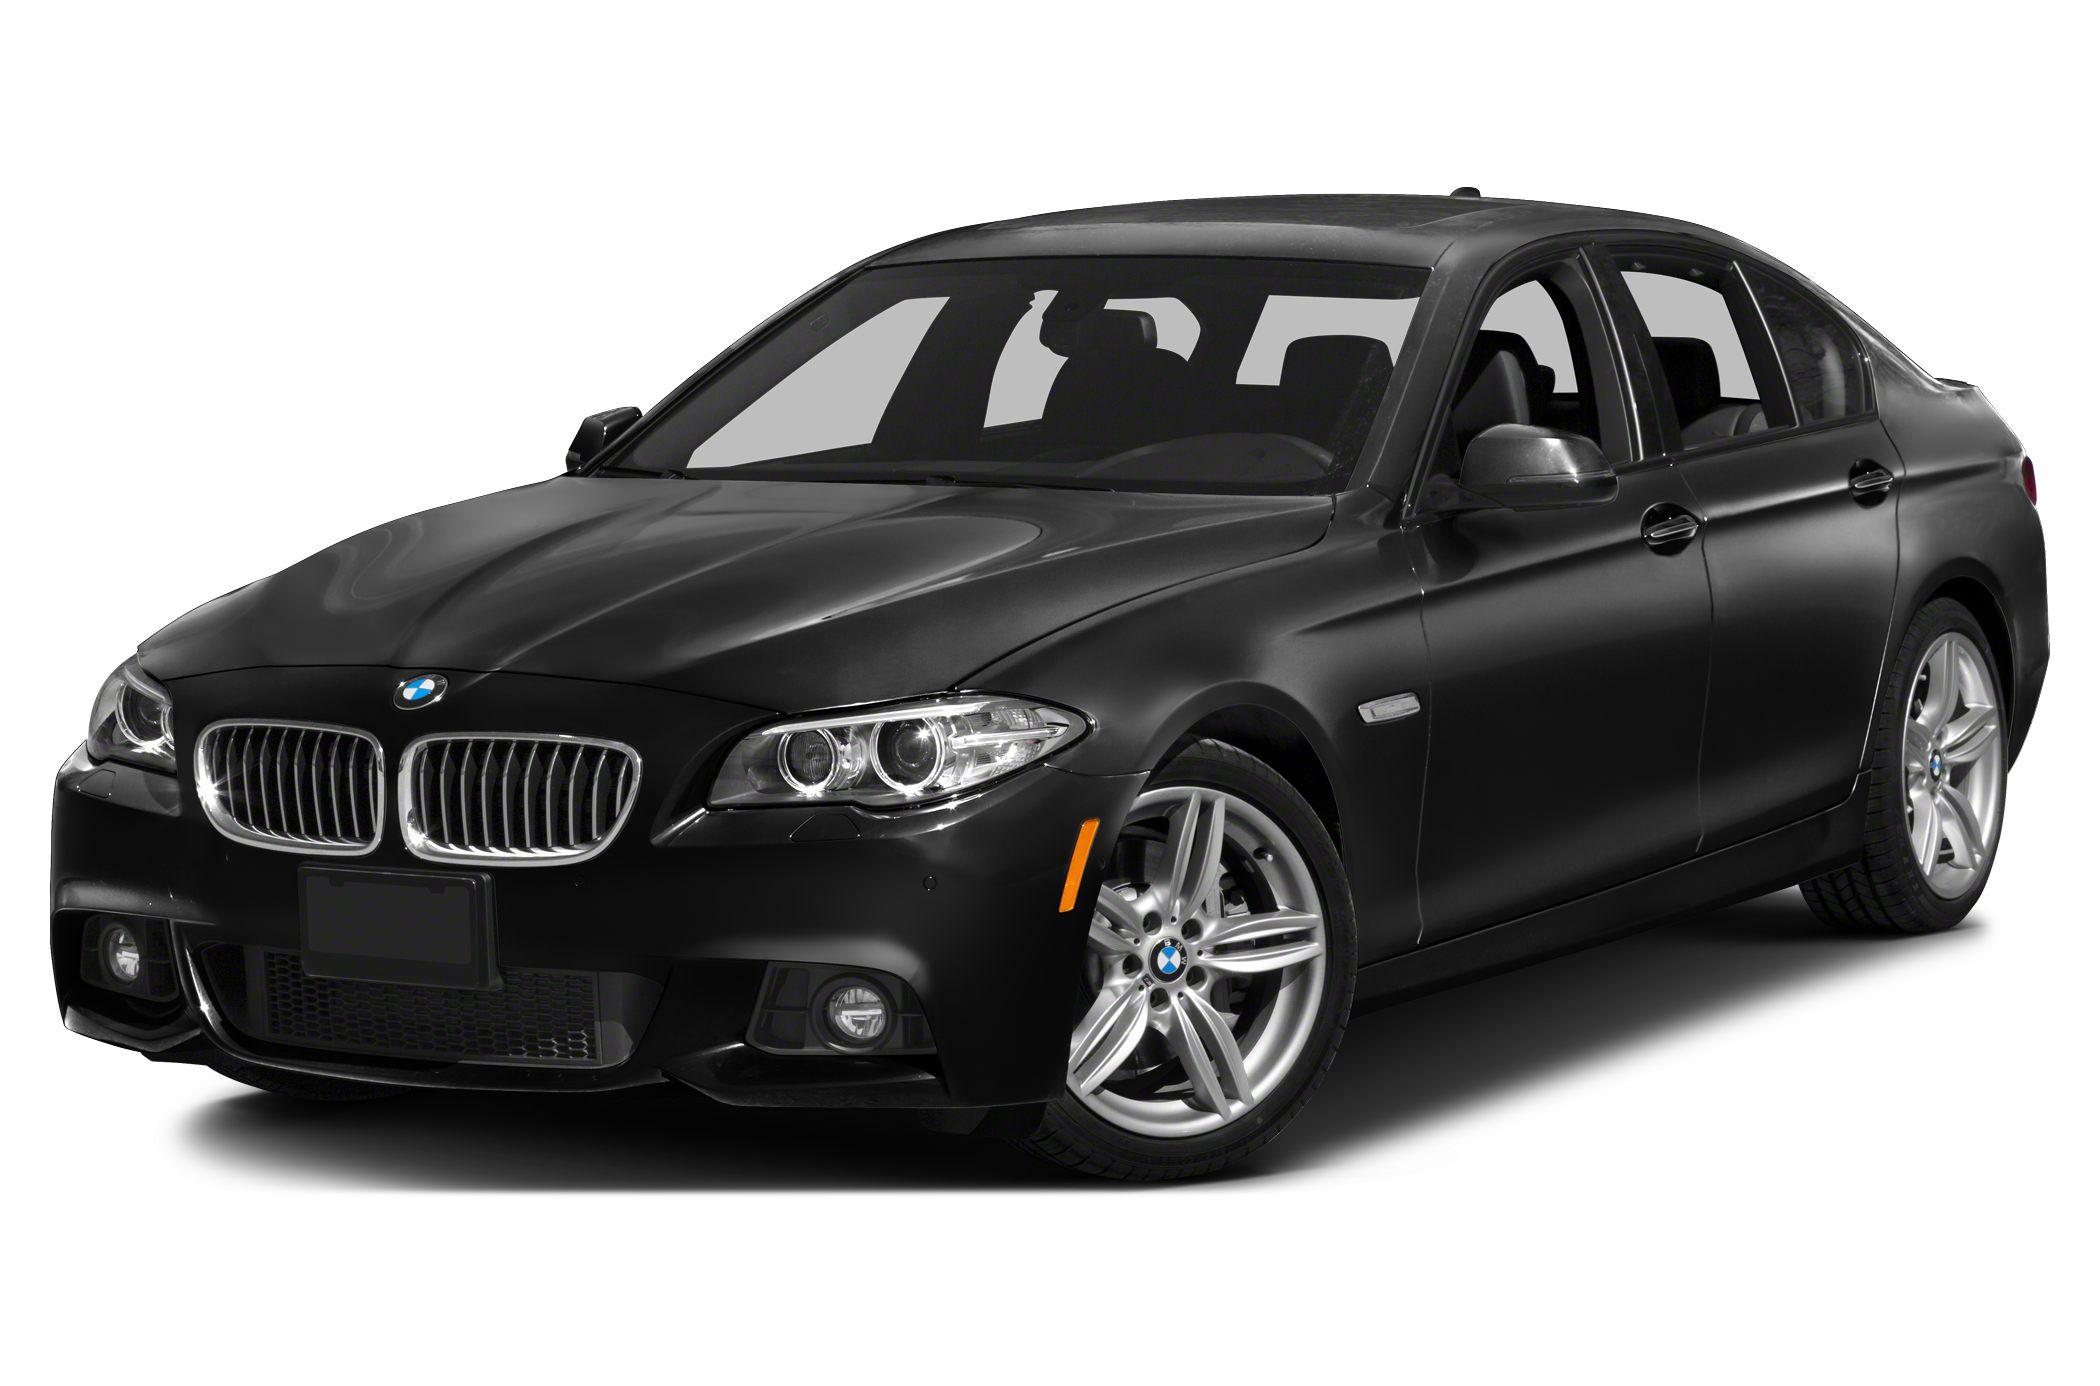 2015 BMW 535d Information